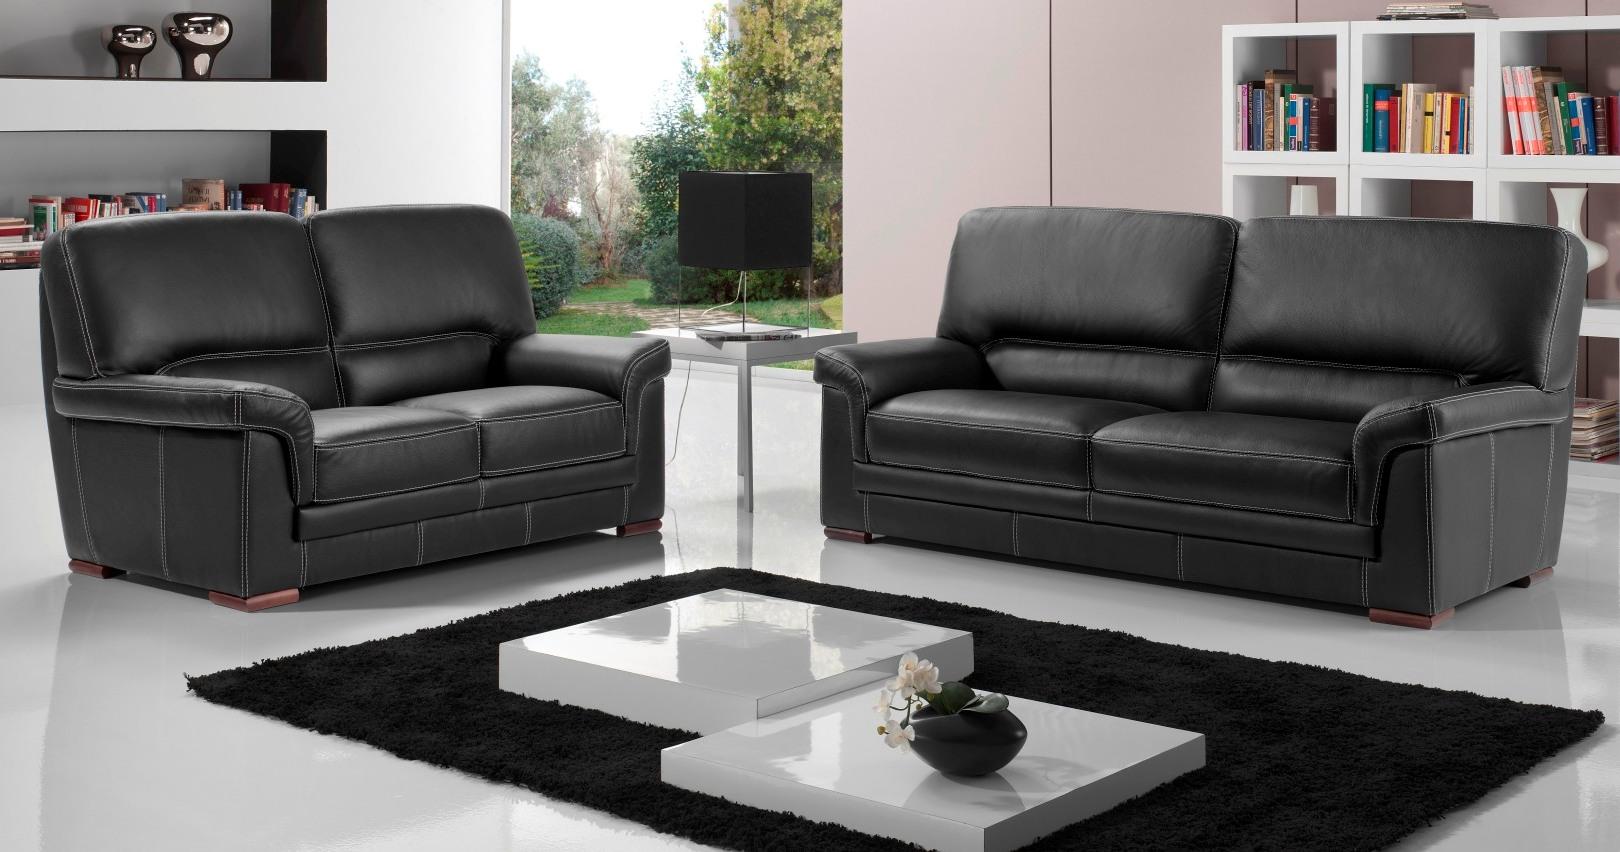 milan salon 3 2 cuir buffle premium personnalisable sur